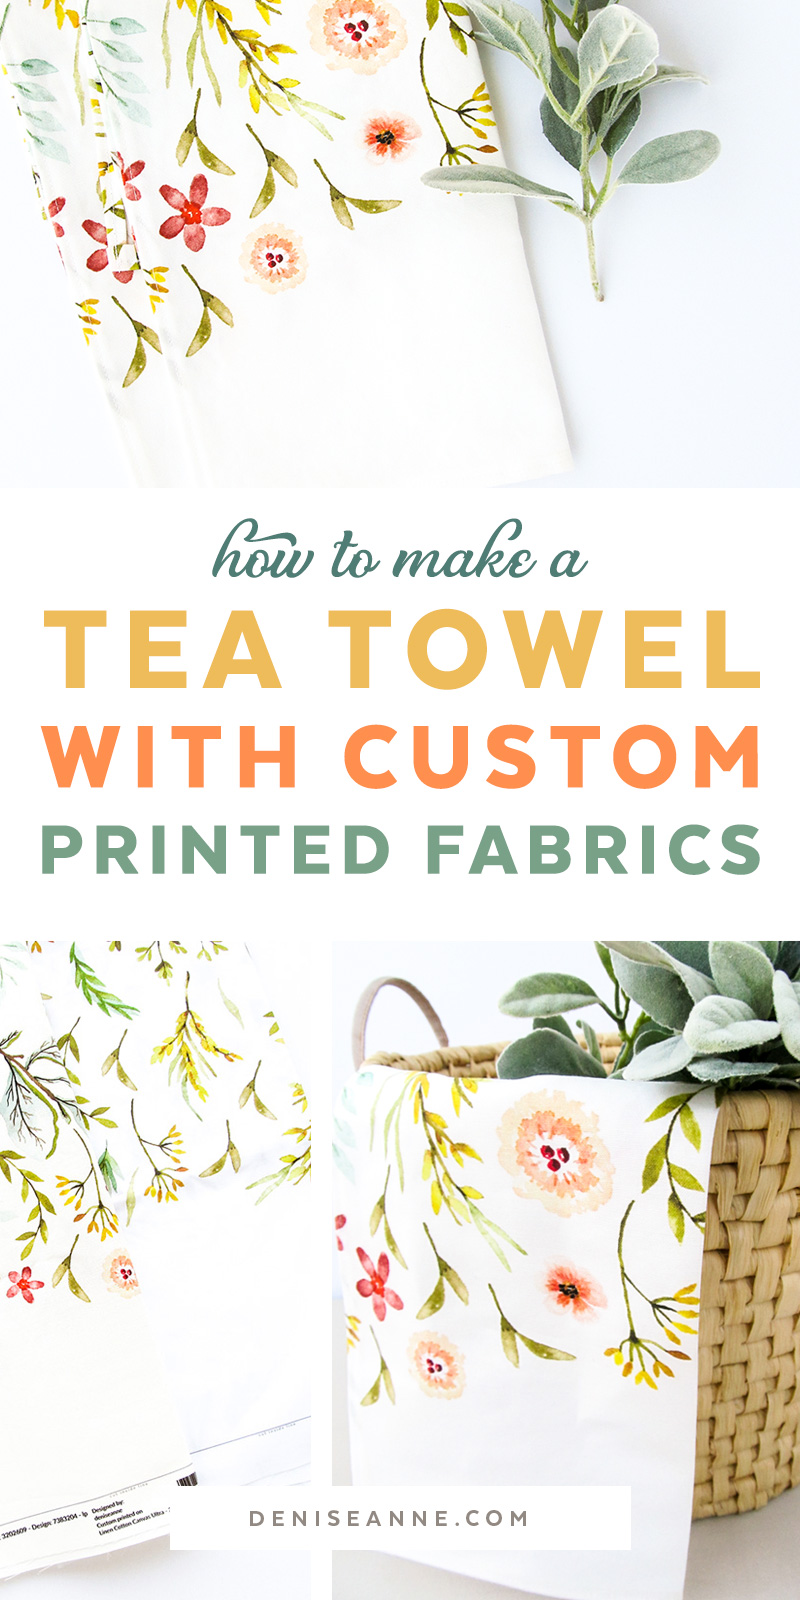 How To Make A Tea Towel Using Custom Printed Fabrics Denise Anne